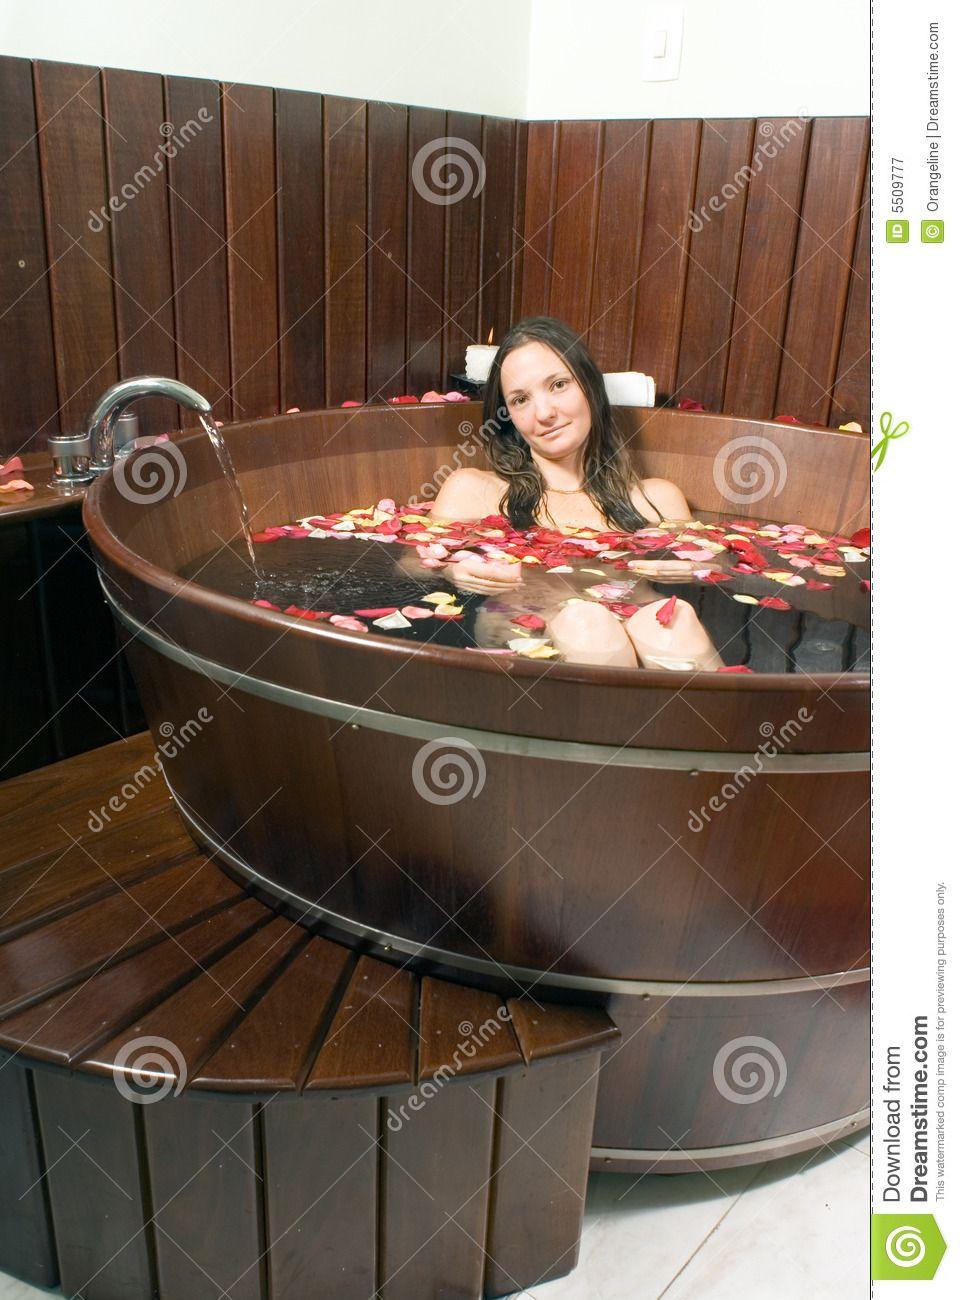 spa soaking tub - Google Search | Limes | Pinterest | Tubs